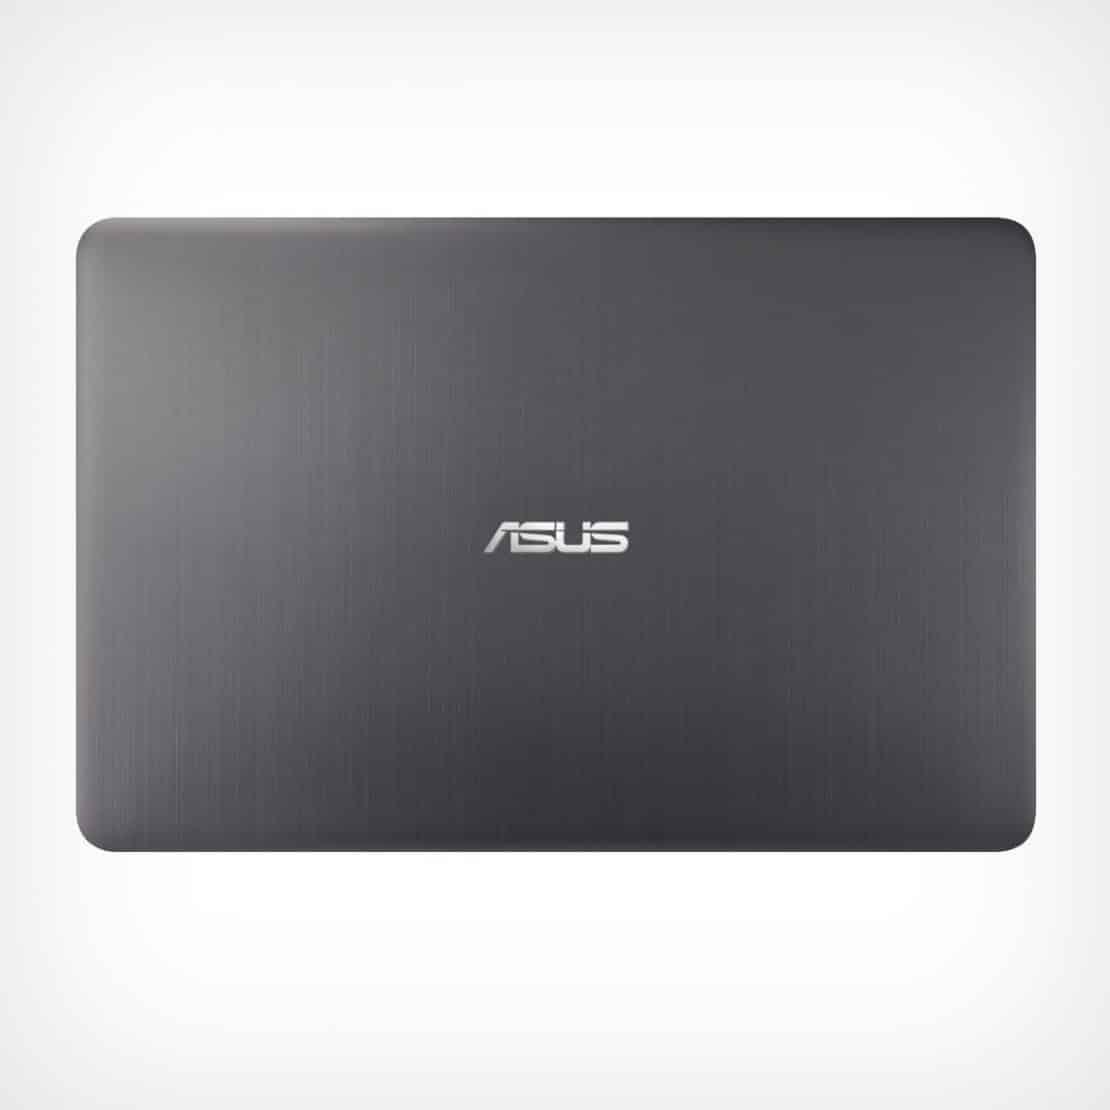 ASUS K501LX 15.6 Gaming Laptop - Gaming Laptops Under 1000 Dollars - Affordable Gaming Laptop to Buy on a 1000 Dollar Budget